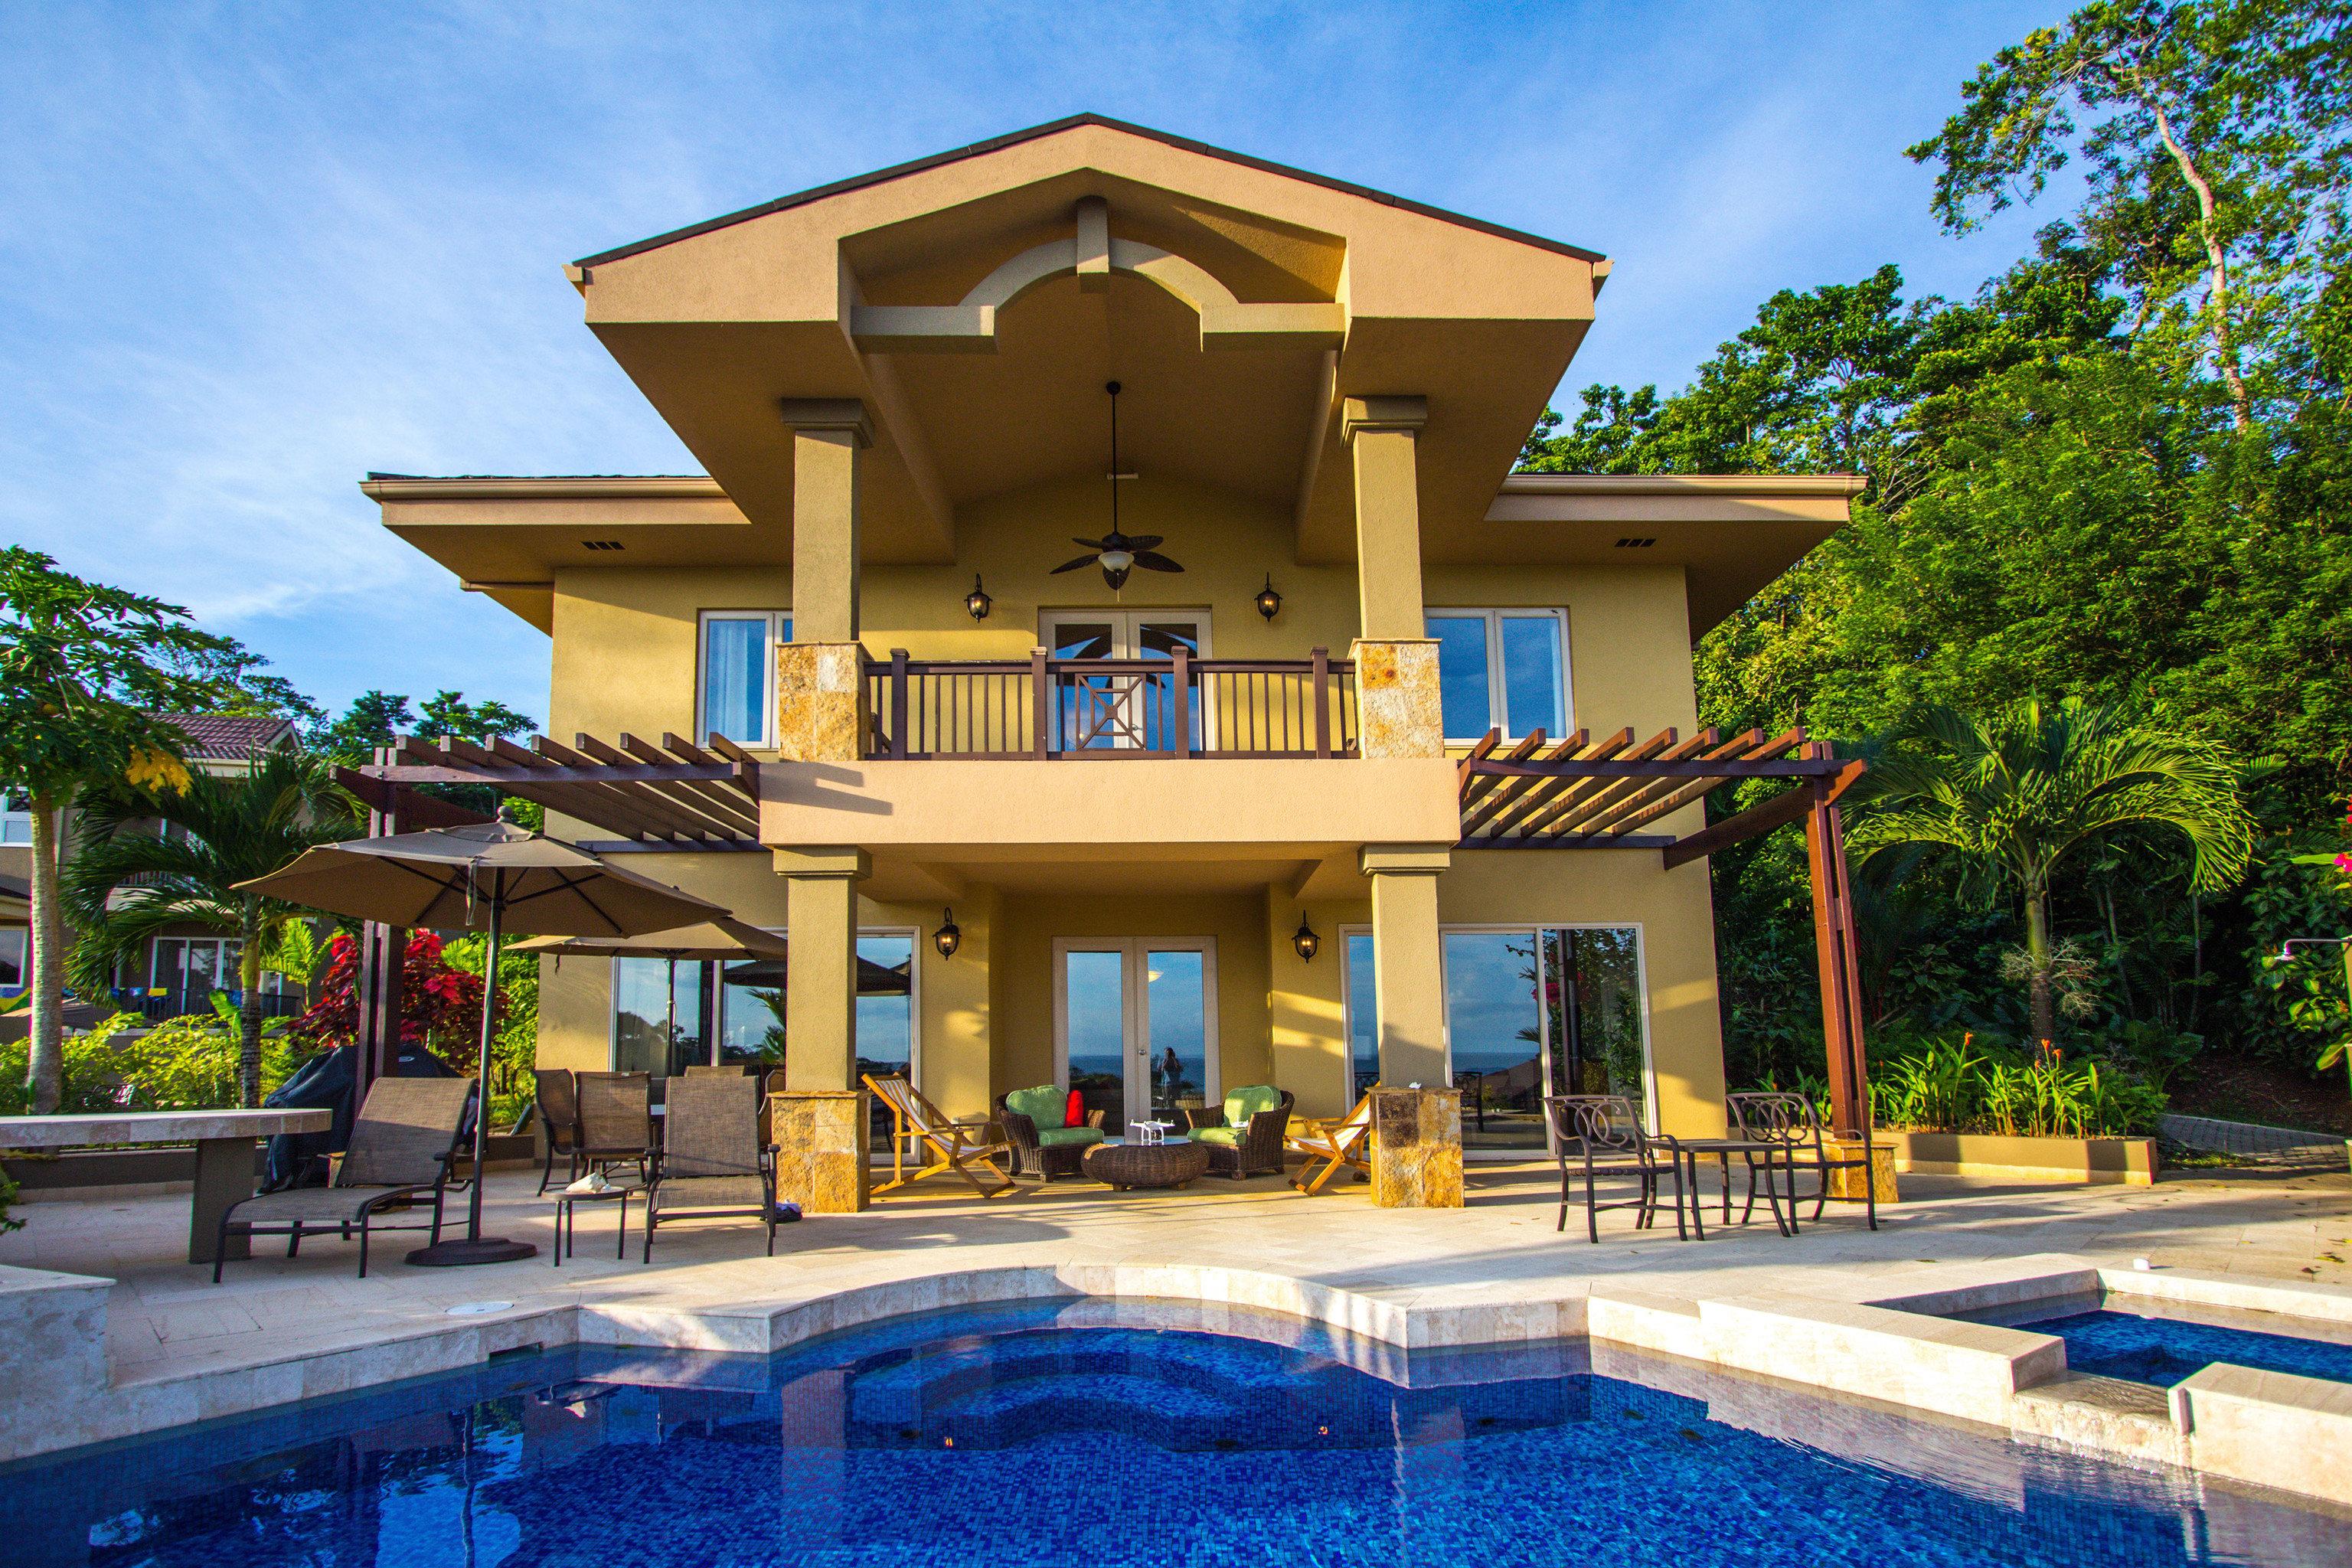 tree sky building property Resort house home condominium mansion Villa swimming pool